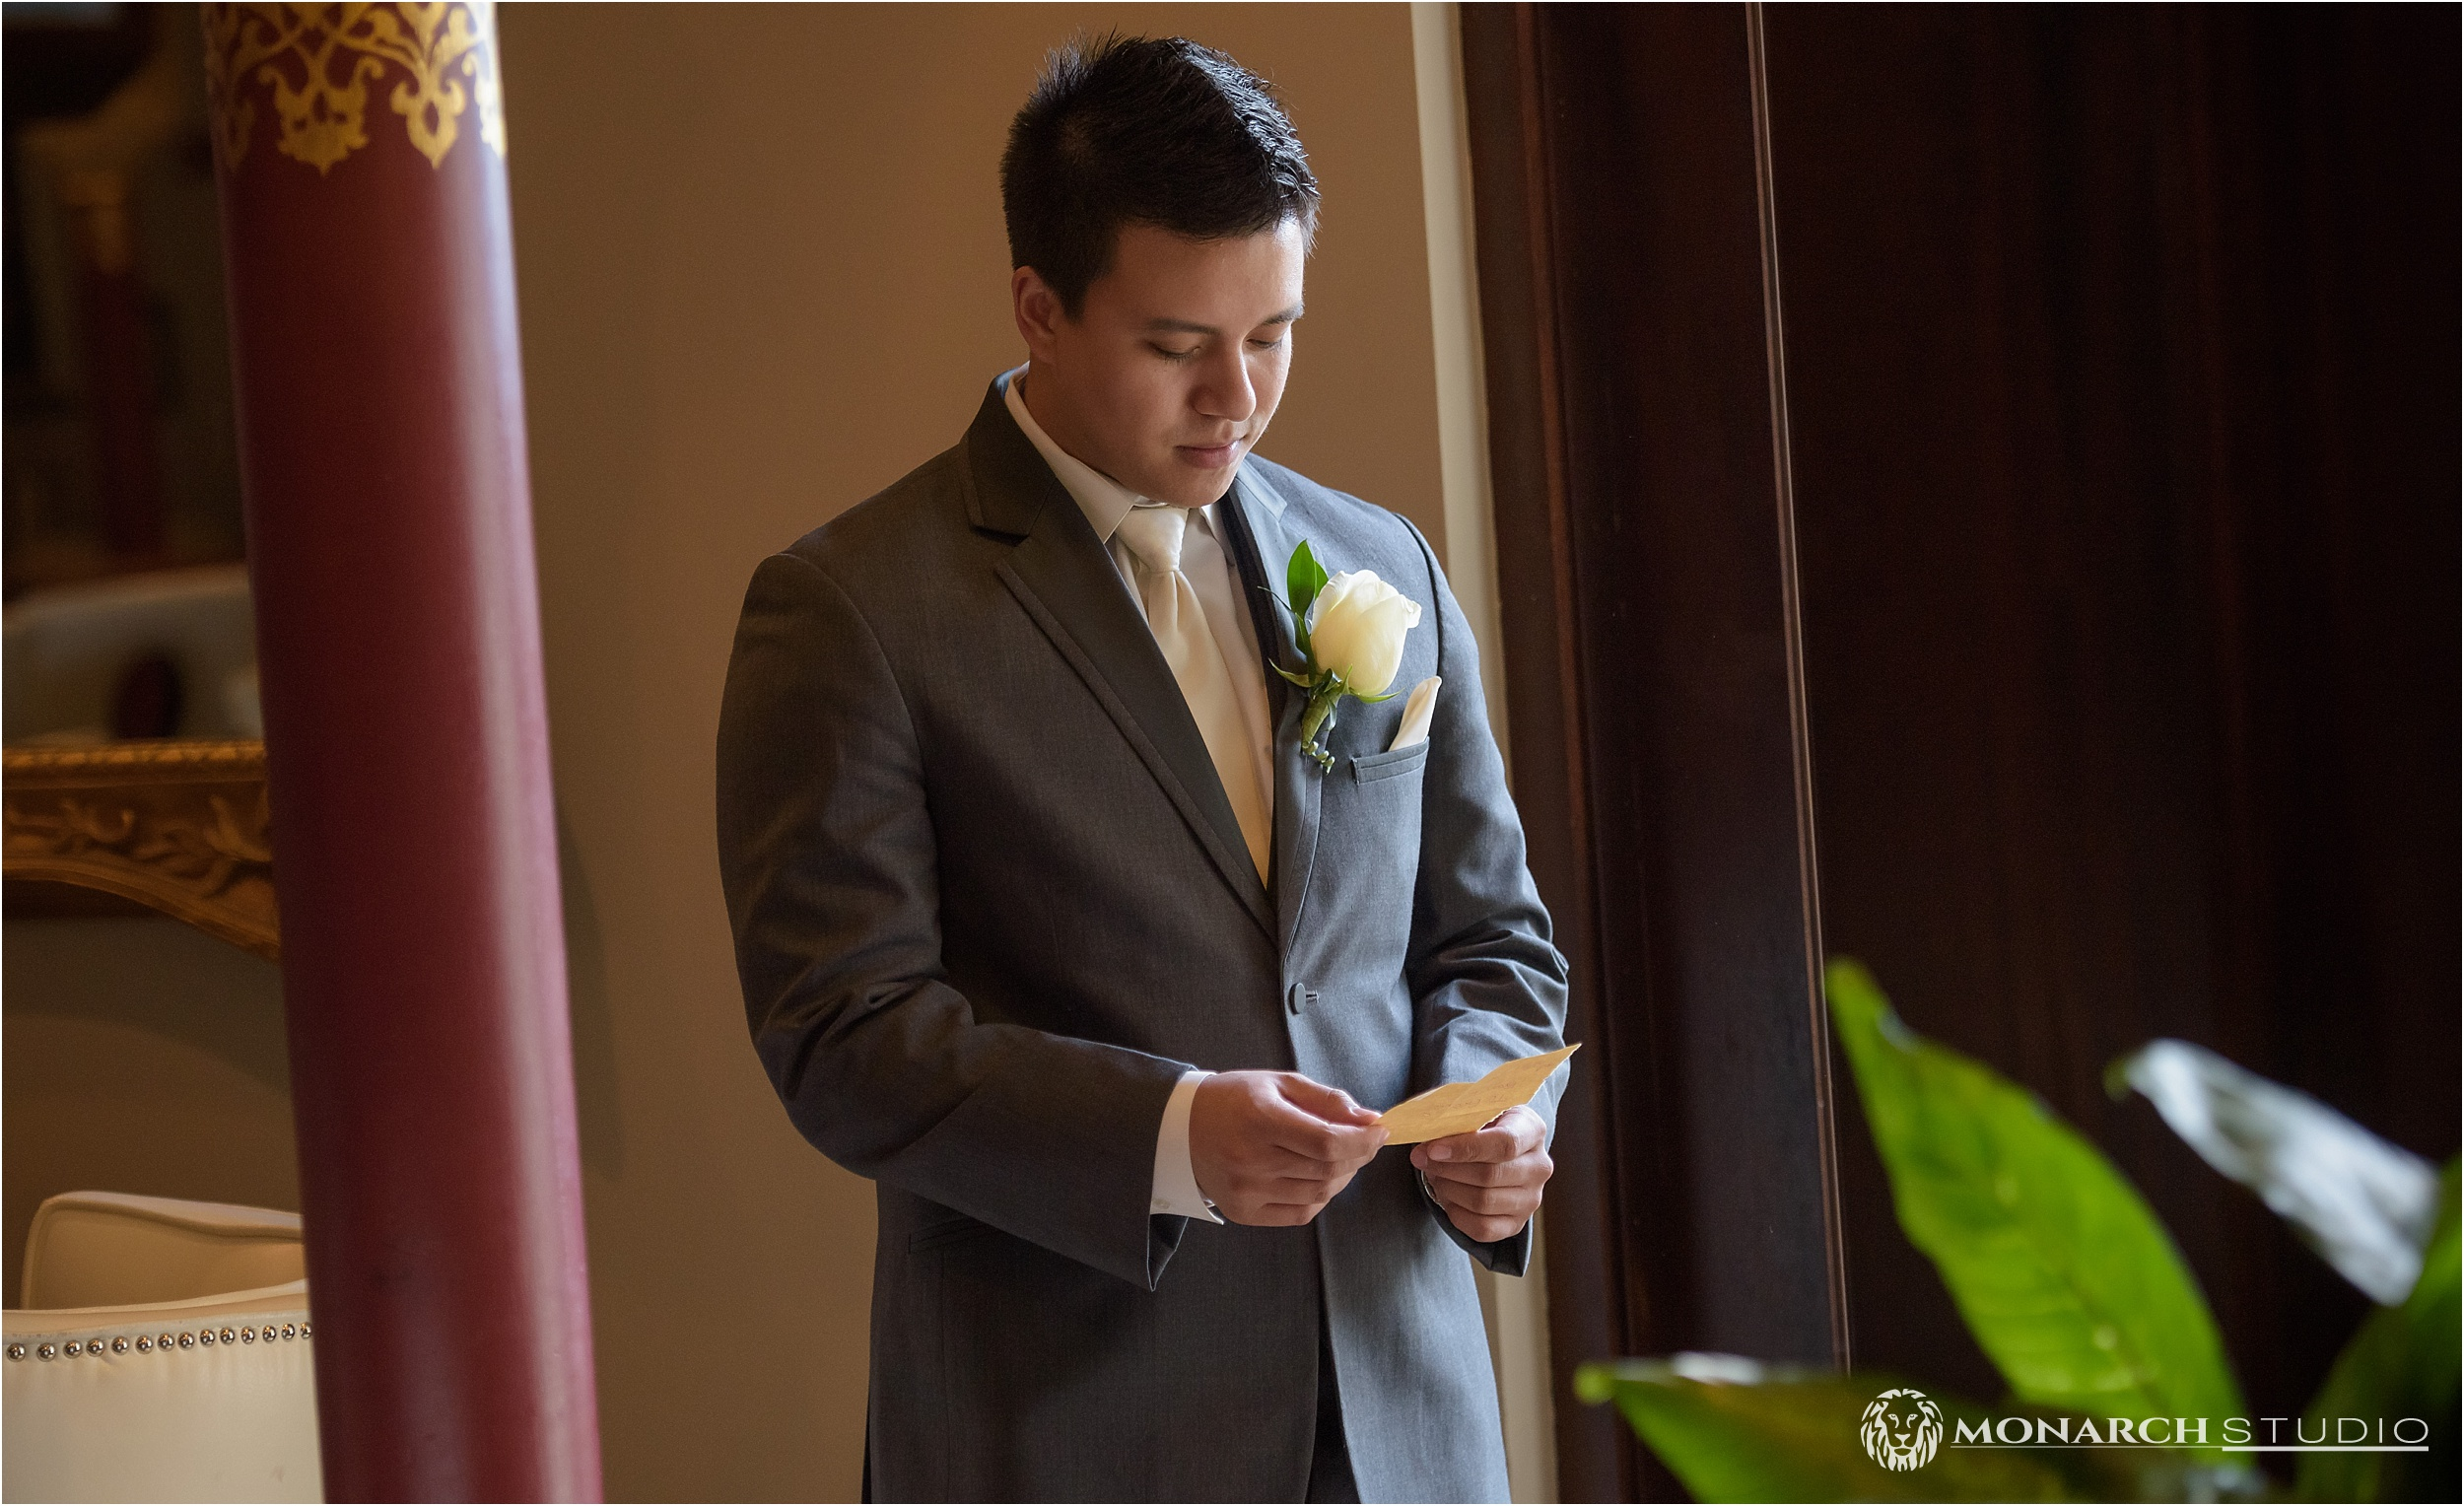 wedding-photographer-in-st-augustine-florida-treasury-008.jpg